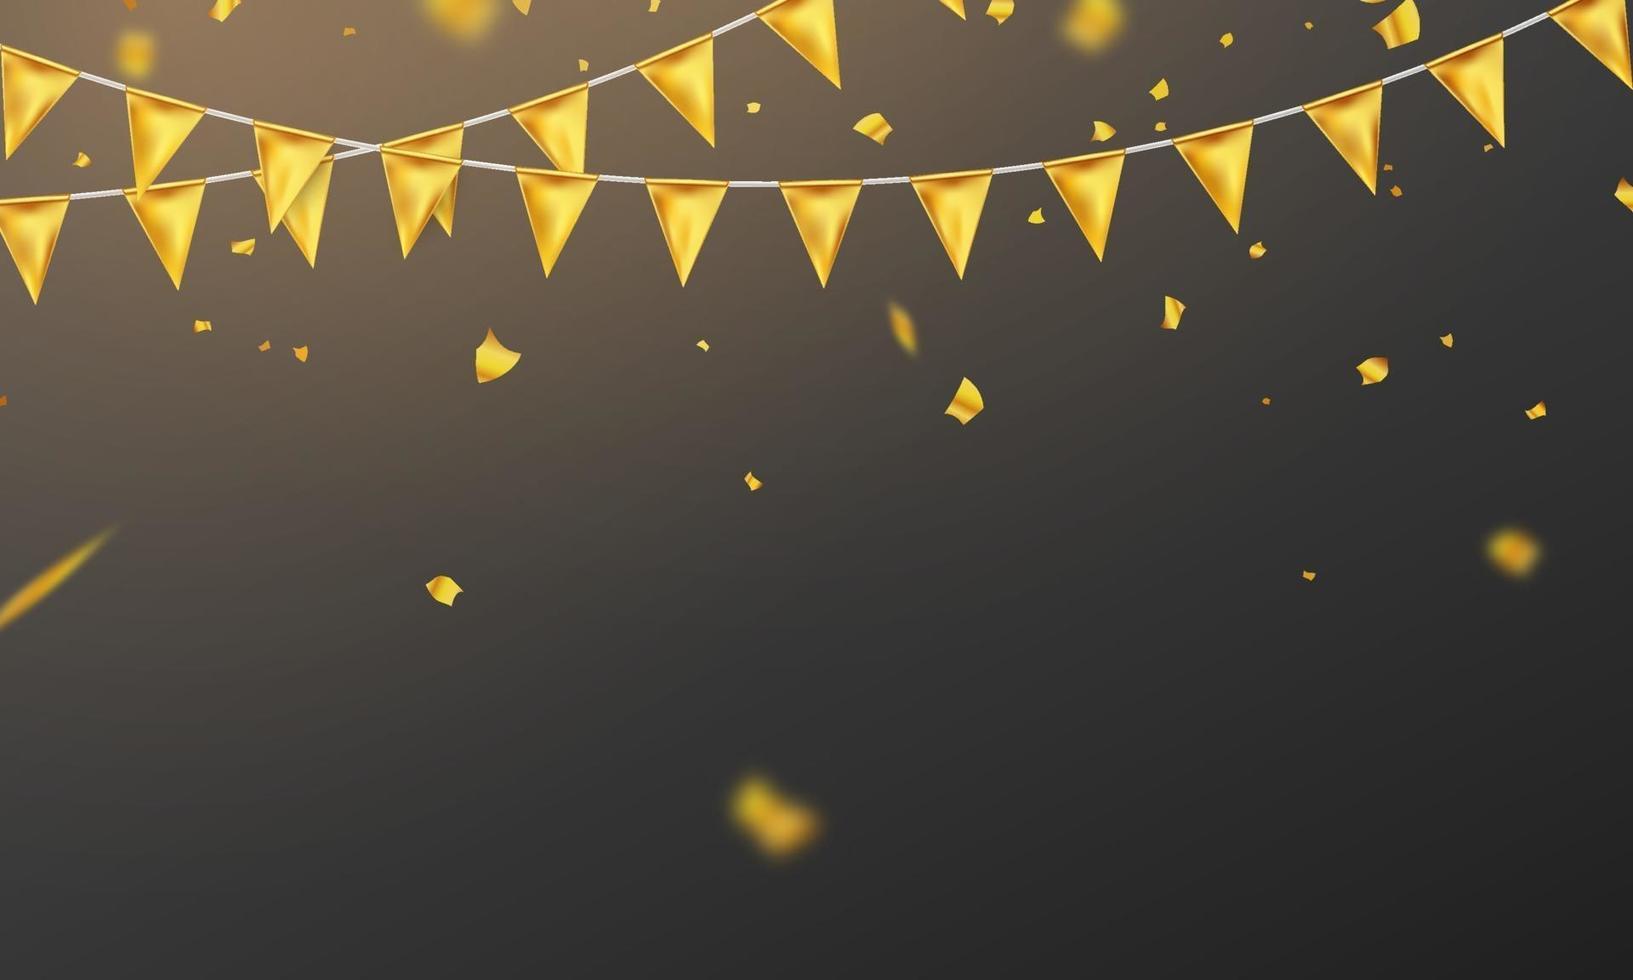 flagga guld konfetti koncept design mall helgdag, bakgrund firande vektorillustration. vektor